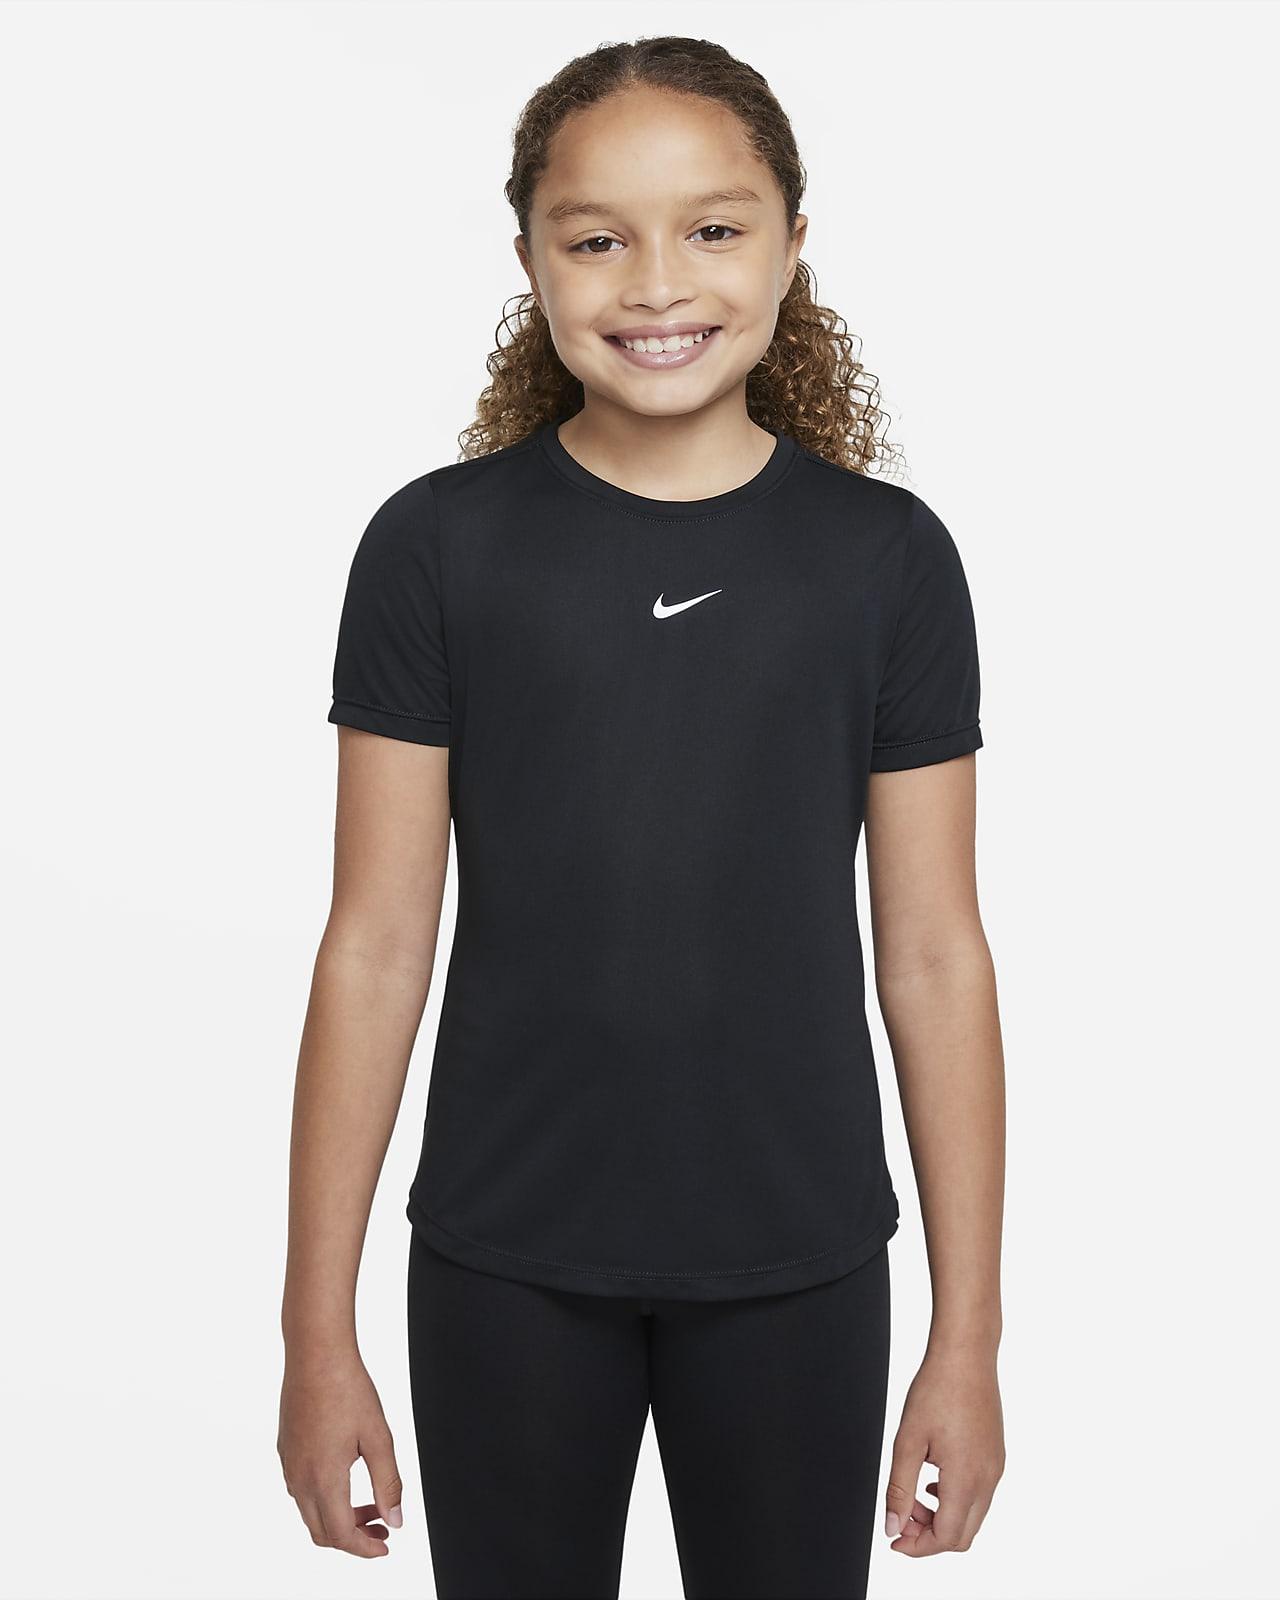 Nike Dri-FIT One Older Kids' (Girls') Short-Sleeve Top